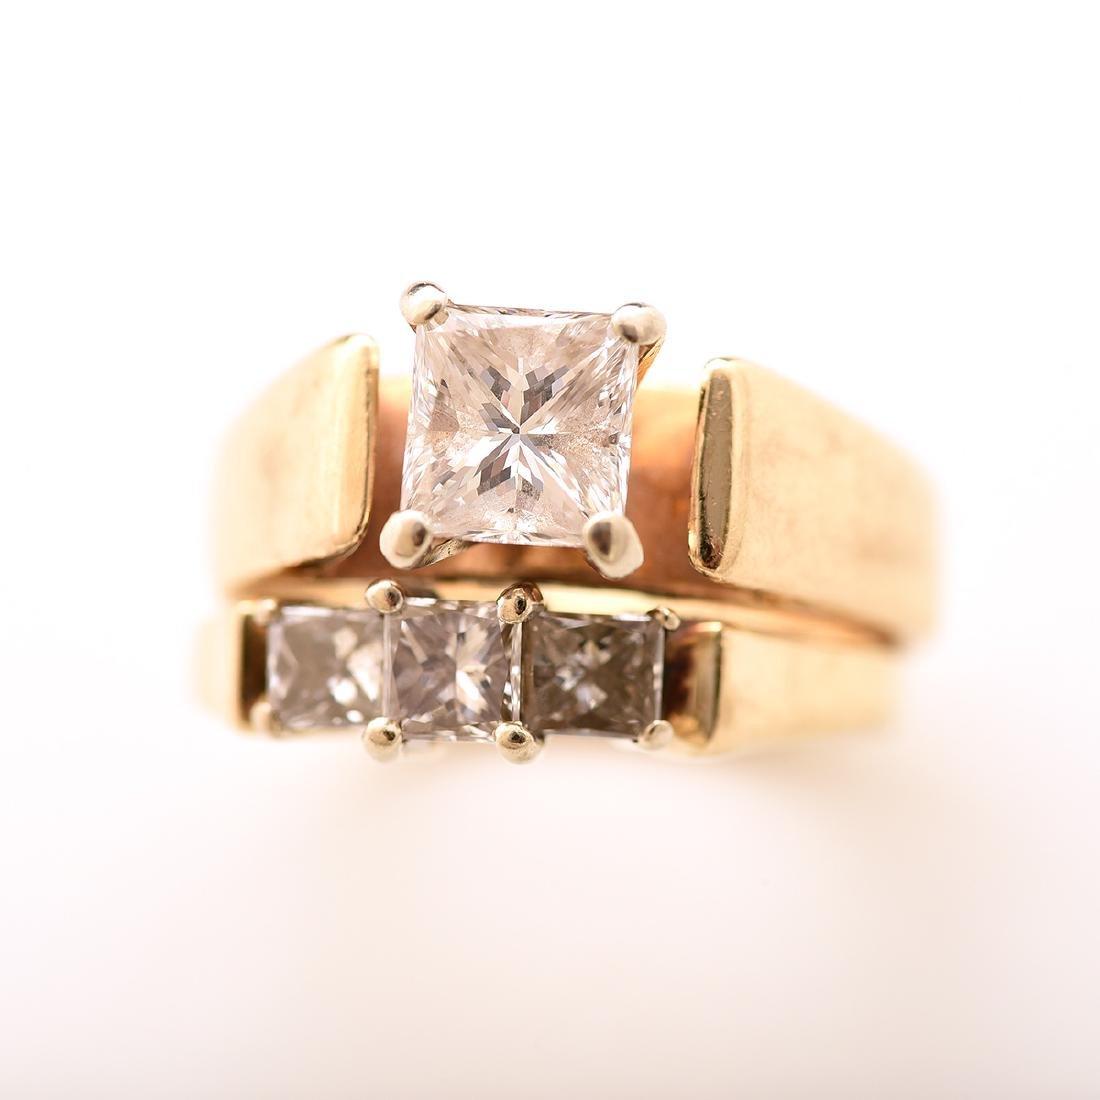 Diamond, 14k Yellow Gold Wedding Ring Set. - 2